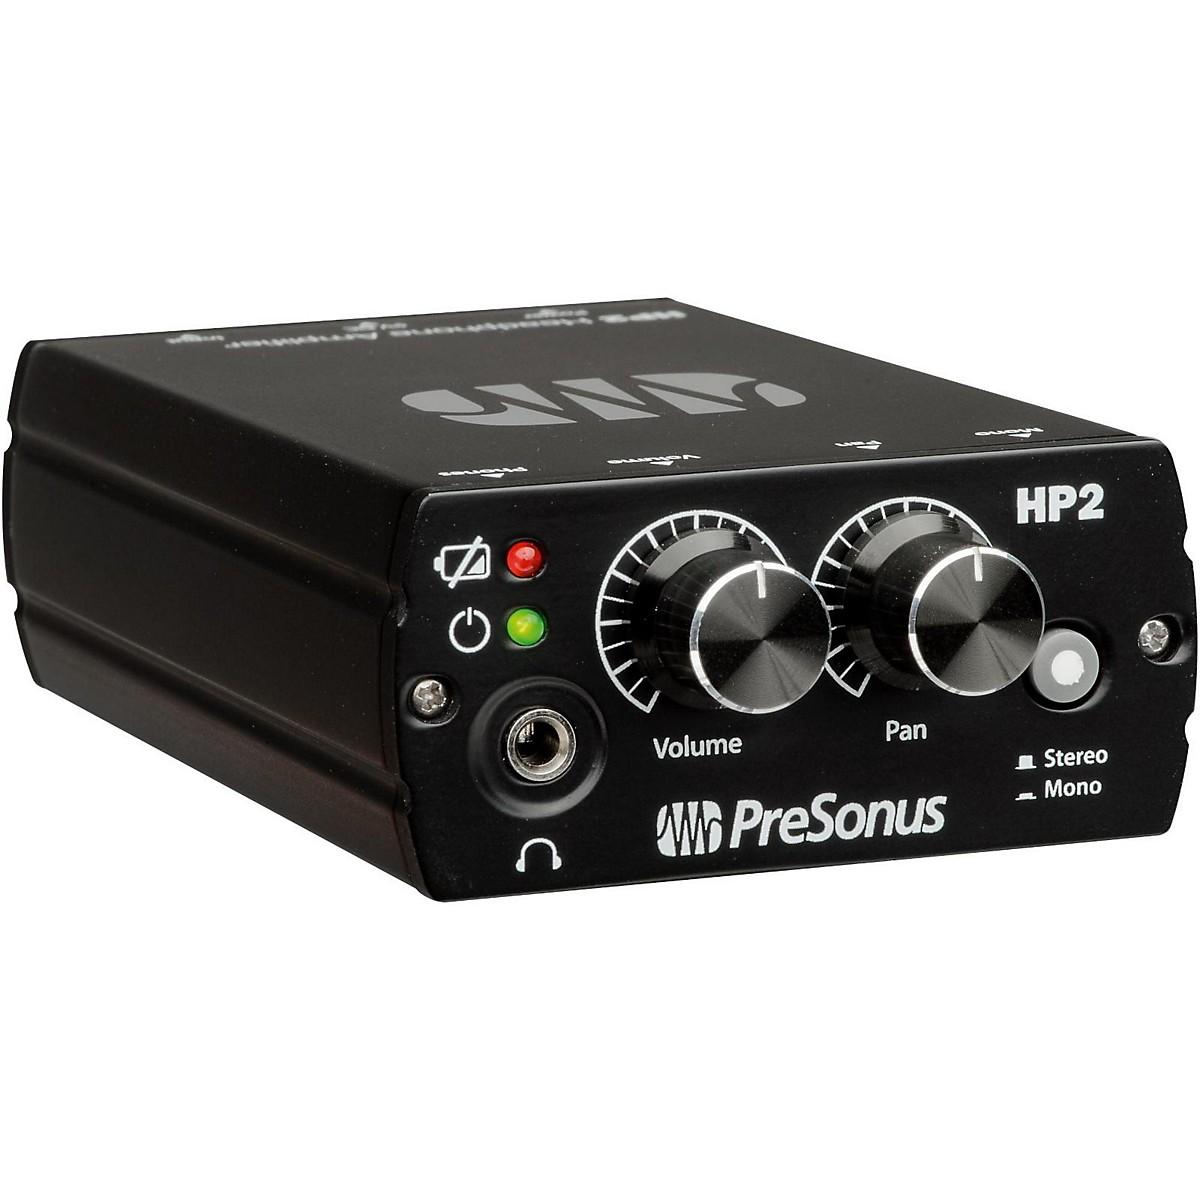 Presonus HP2 Personal Headphone Amplifier